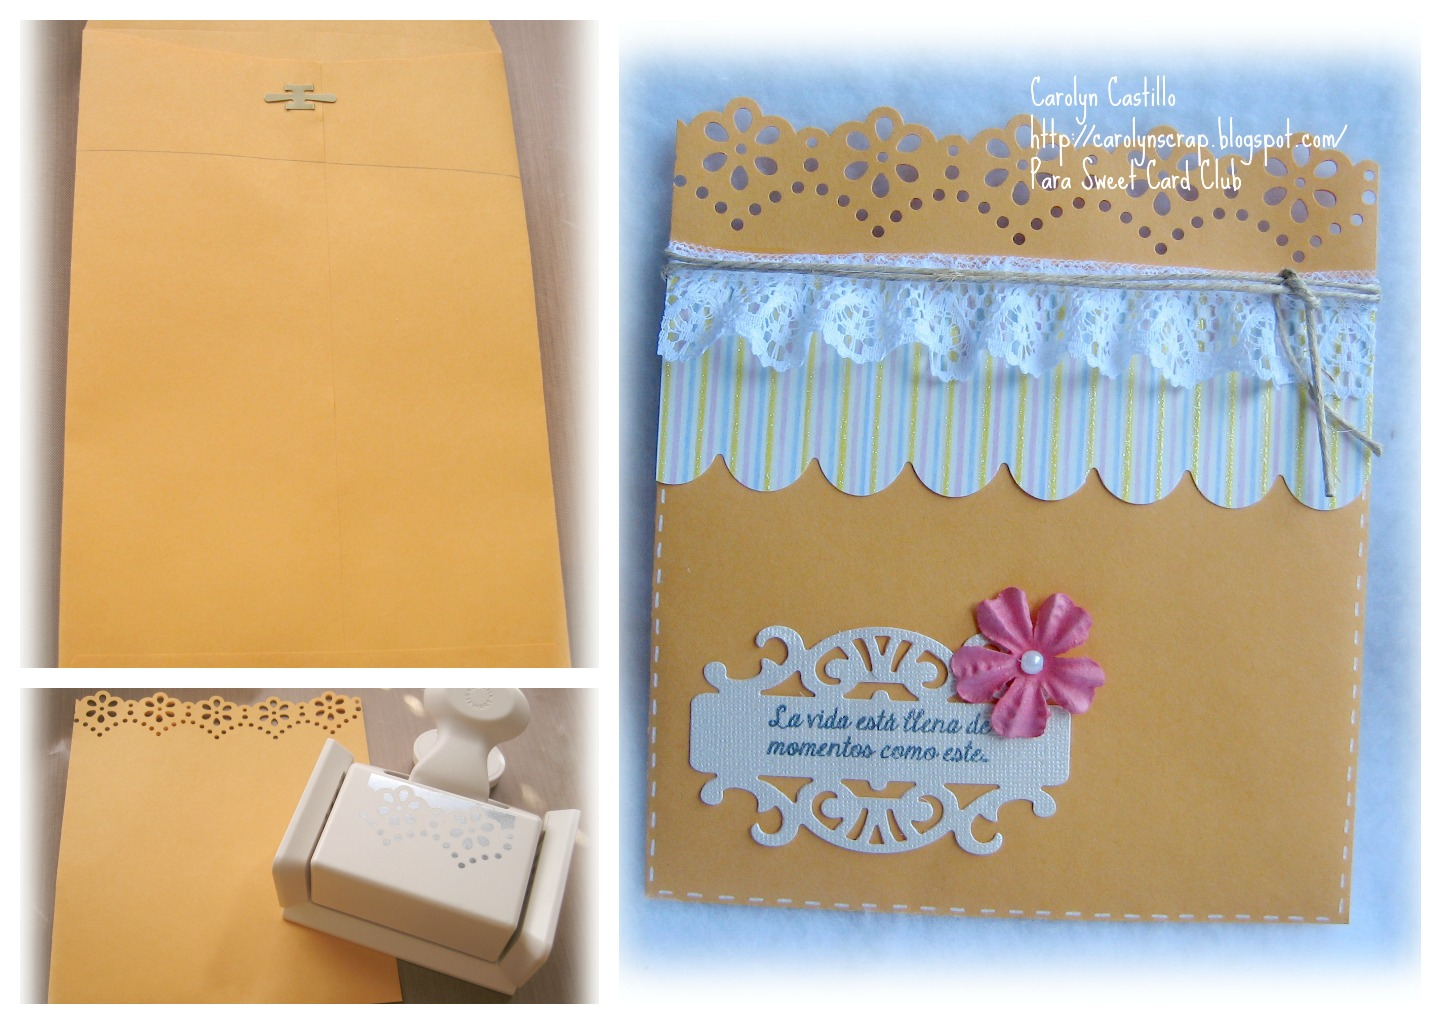 Sweet card club crea tus propios sobres - Como decorar un sobre ...